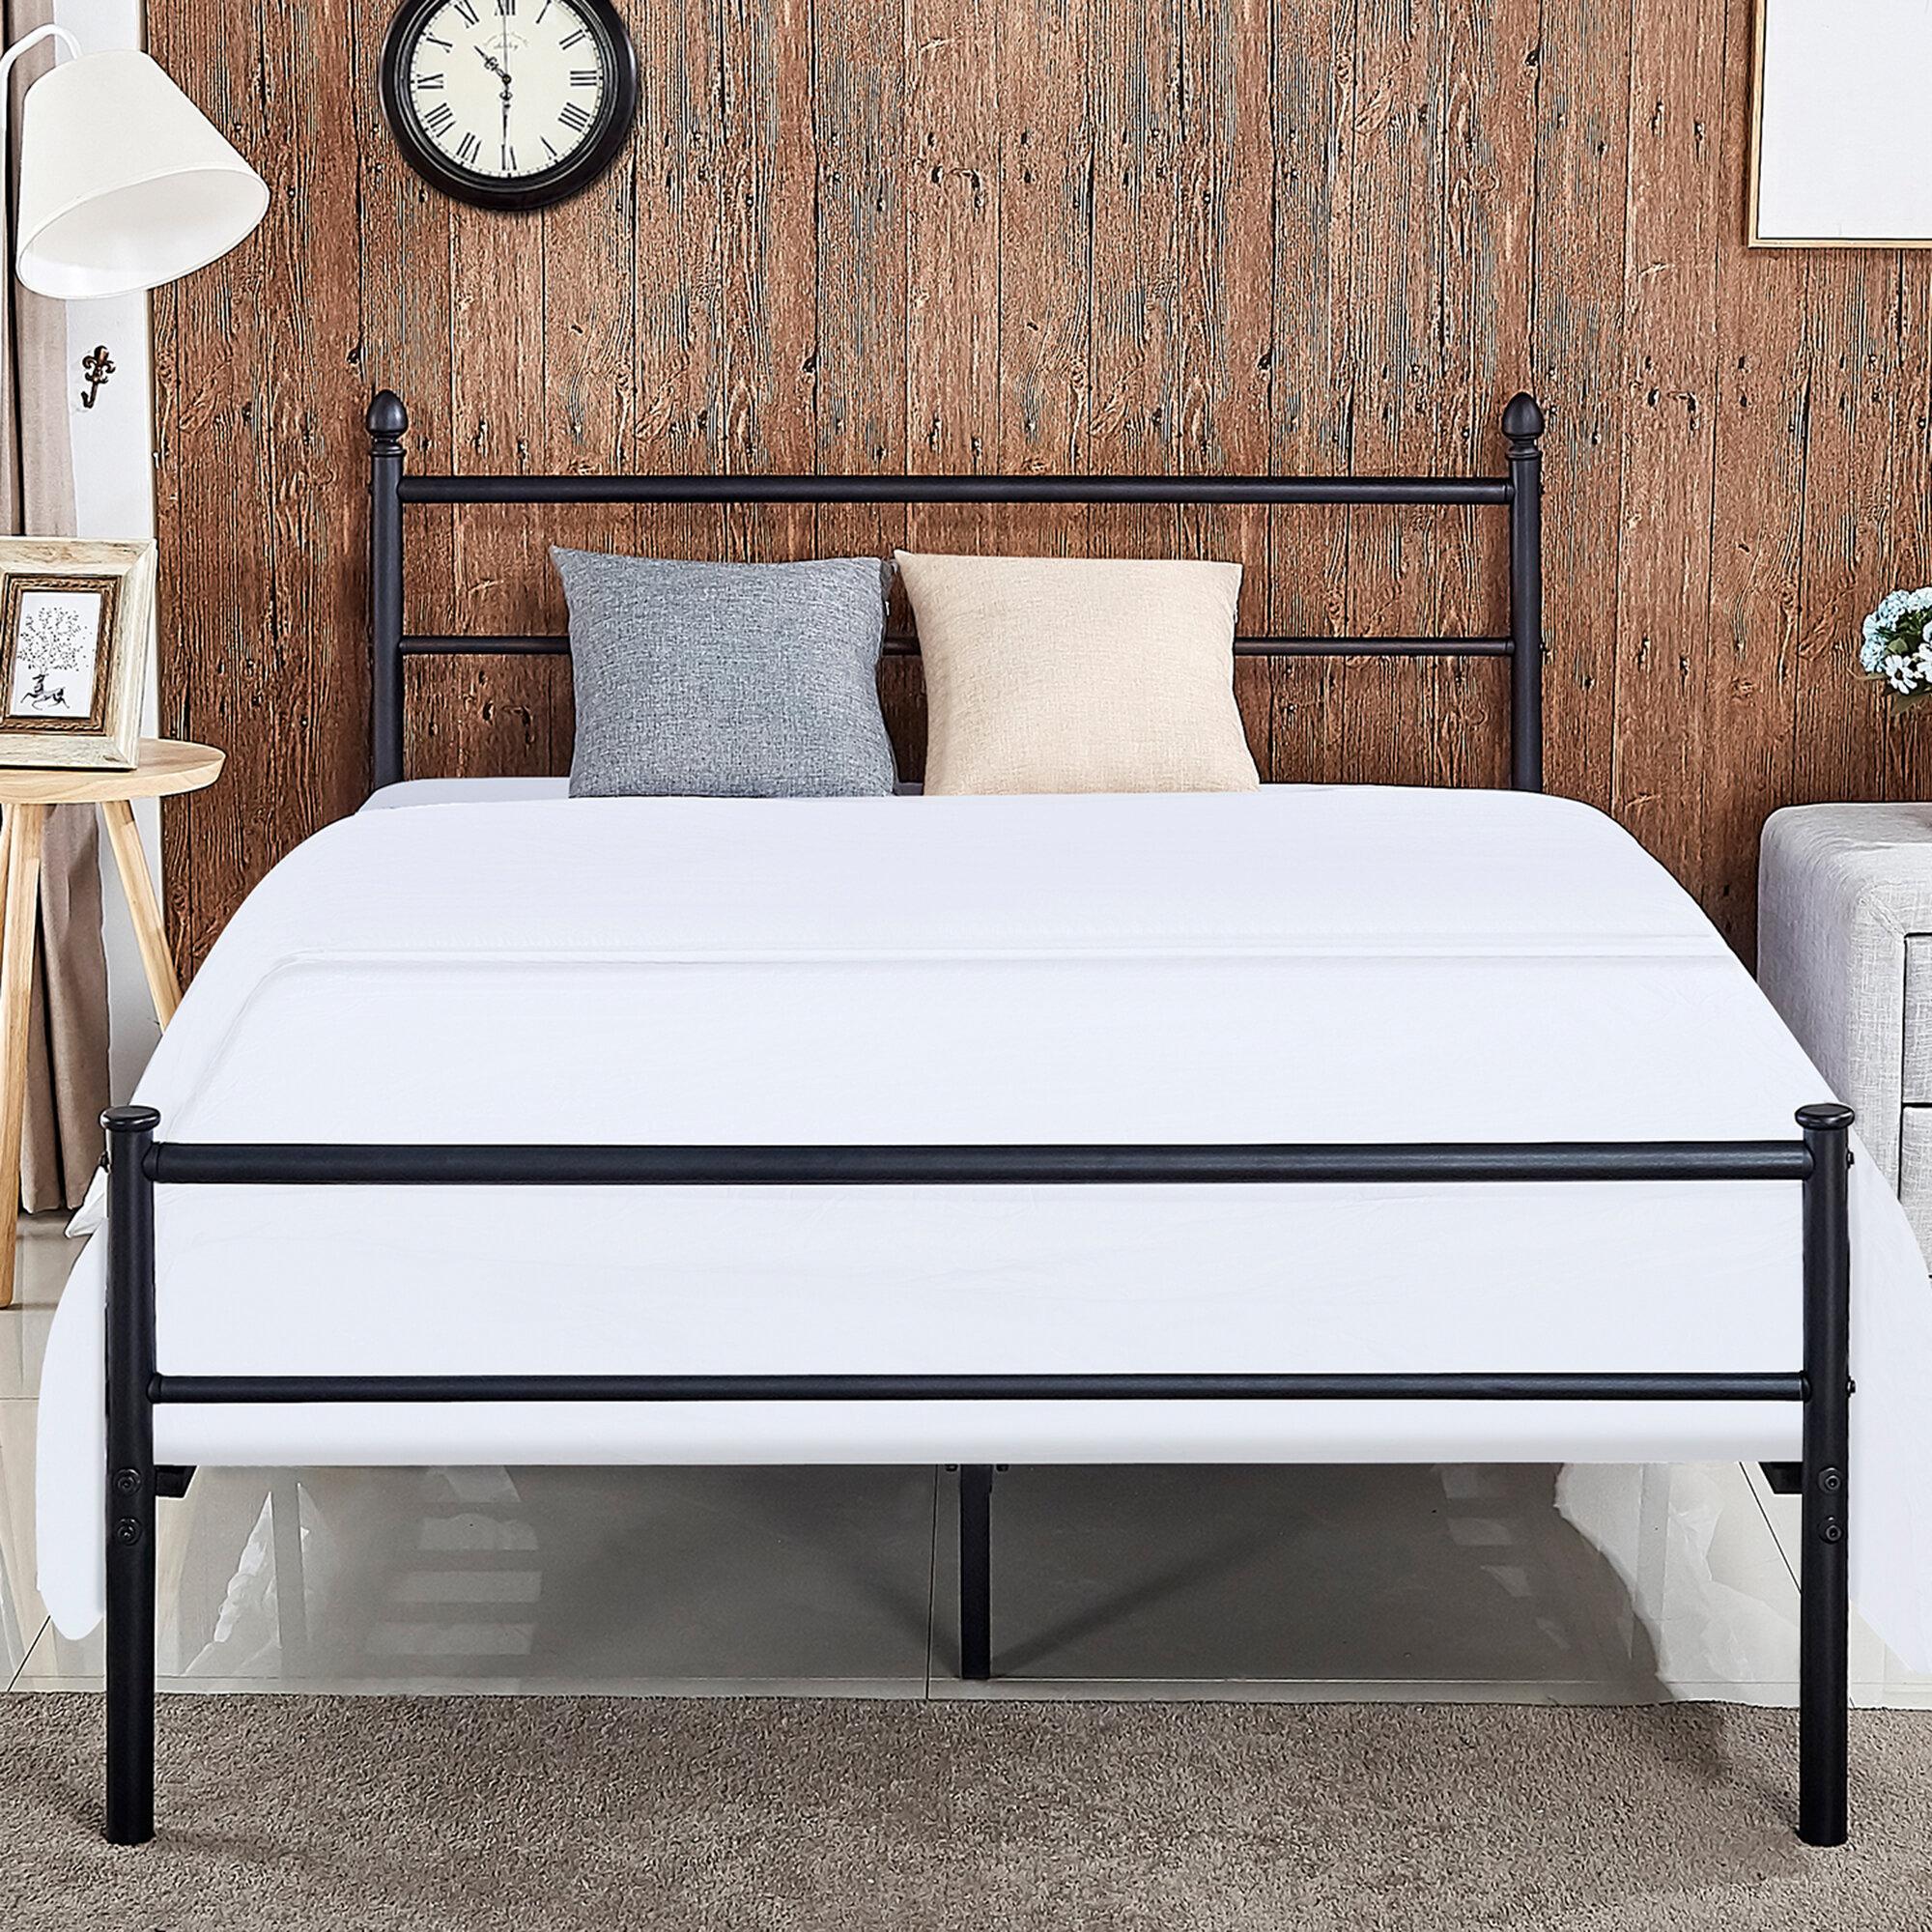 Red Barrel Studio Siobhan Bed Frame & Reviews | Wayfair